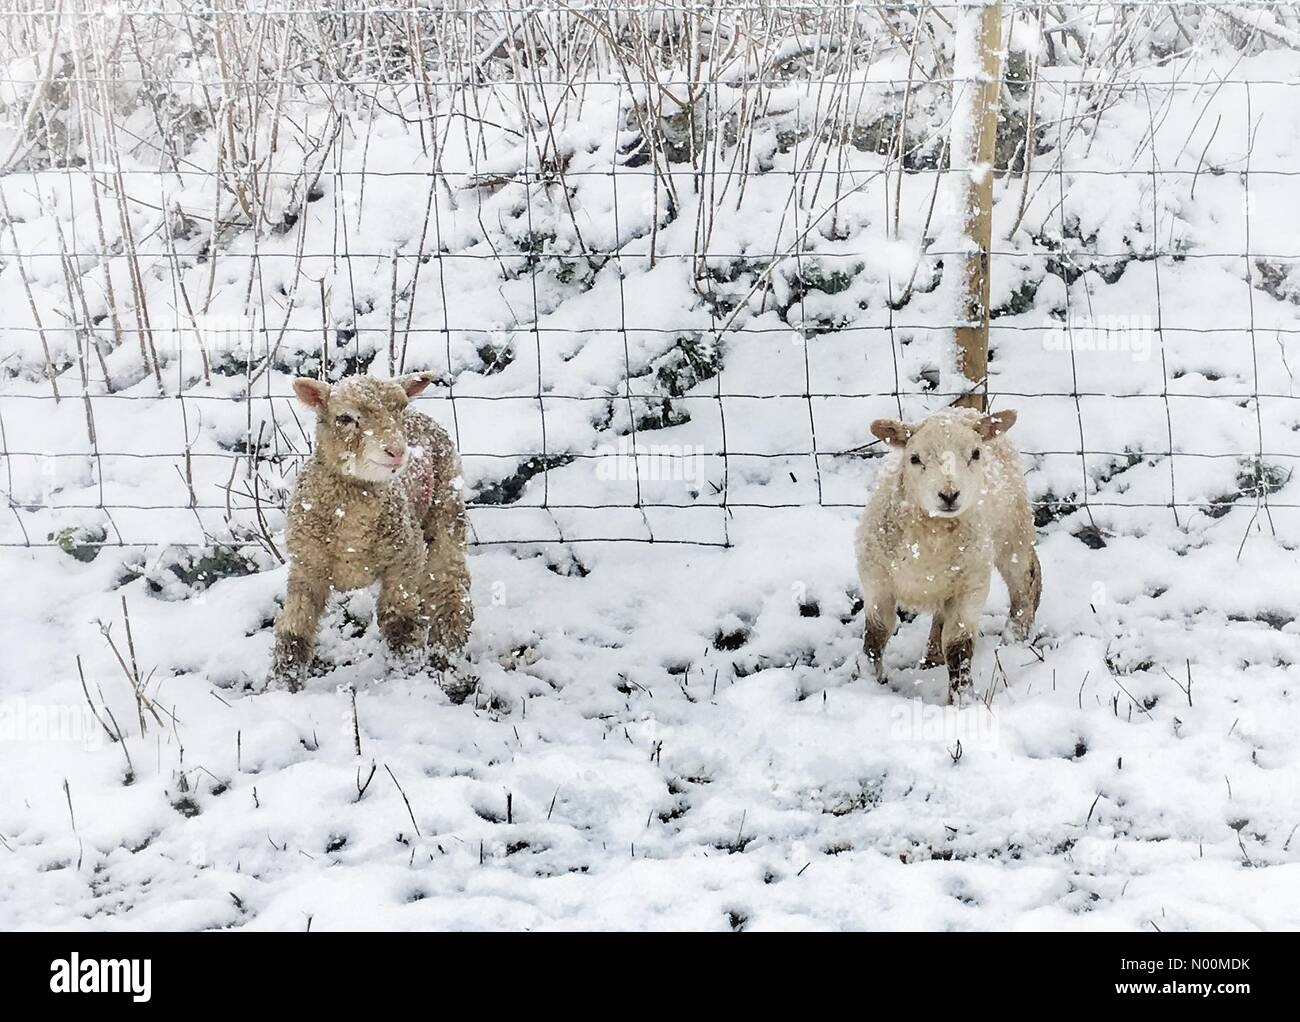 Exeter, UK. 18th Mar, 2018. UK Weather: Dunsford lambs in snow, Devon Credit: nidpor/StockimoNews/Alamy Live News - Stock Image